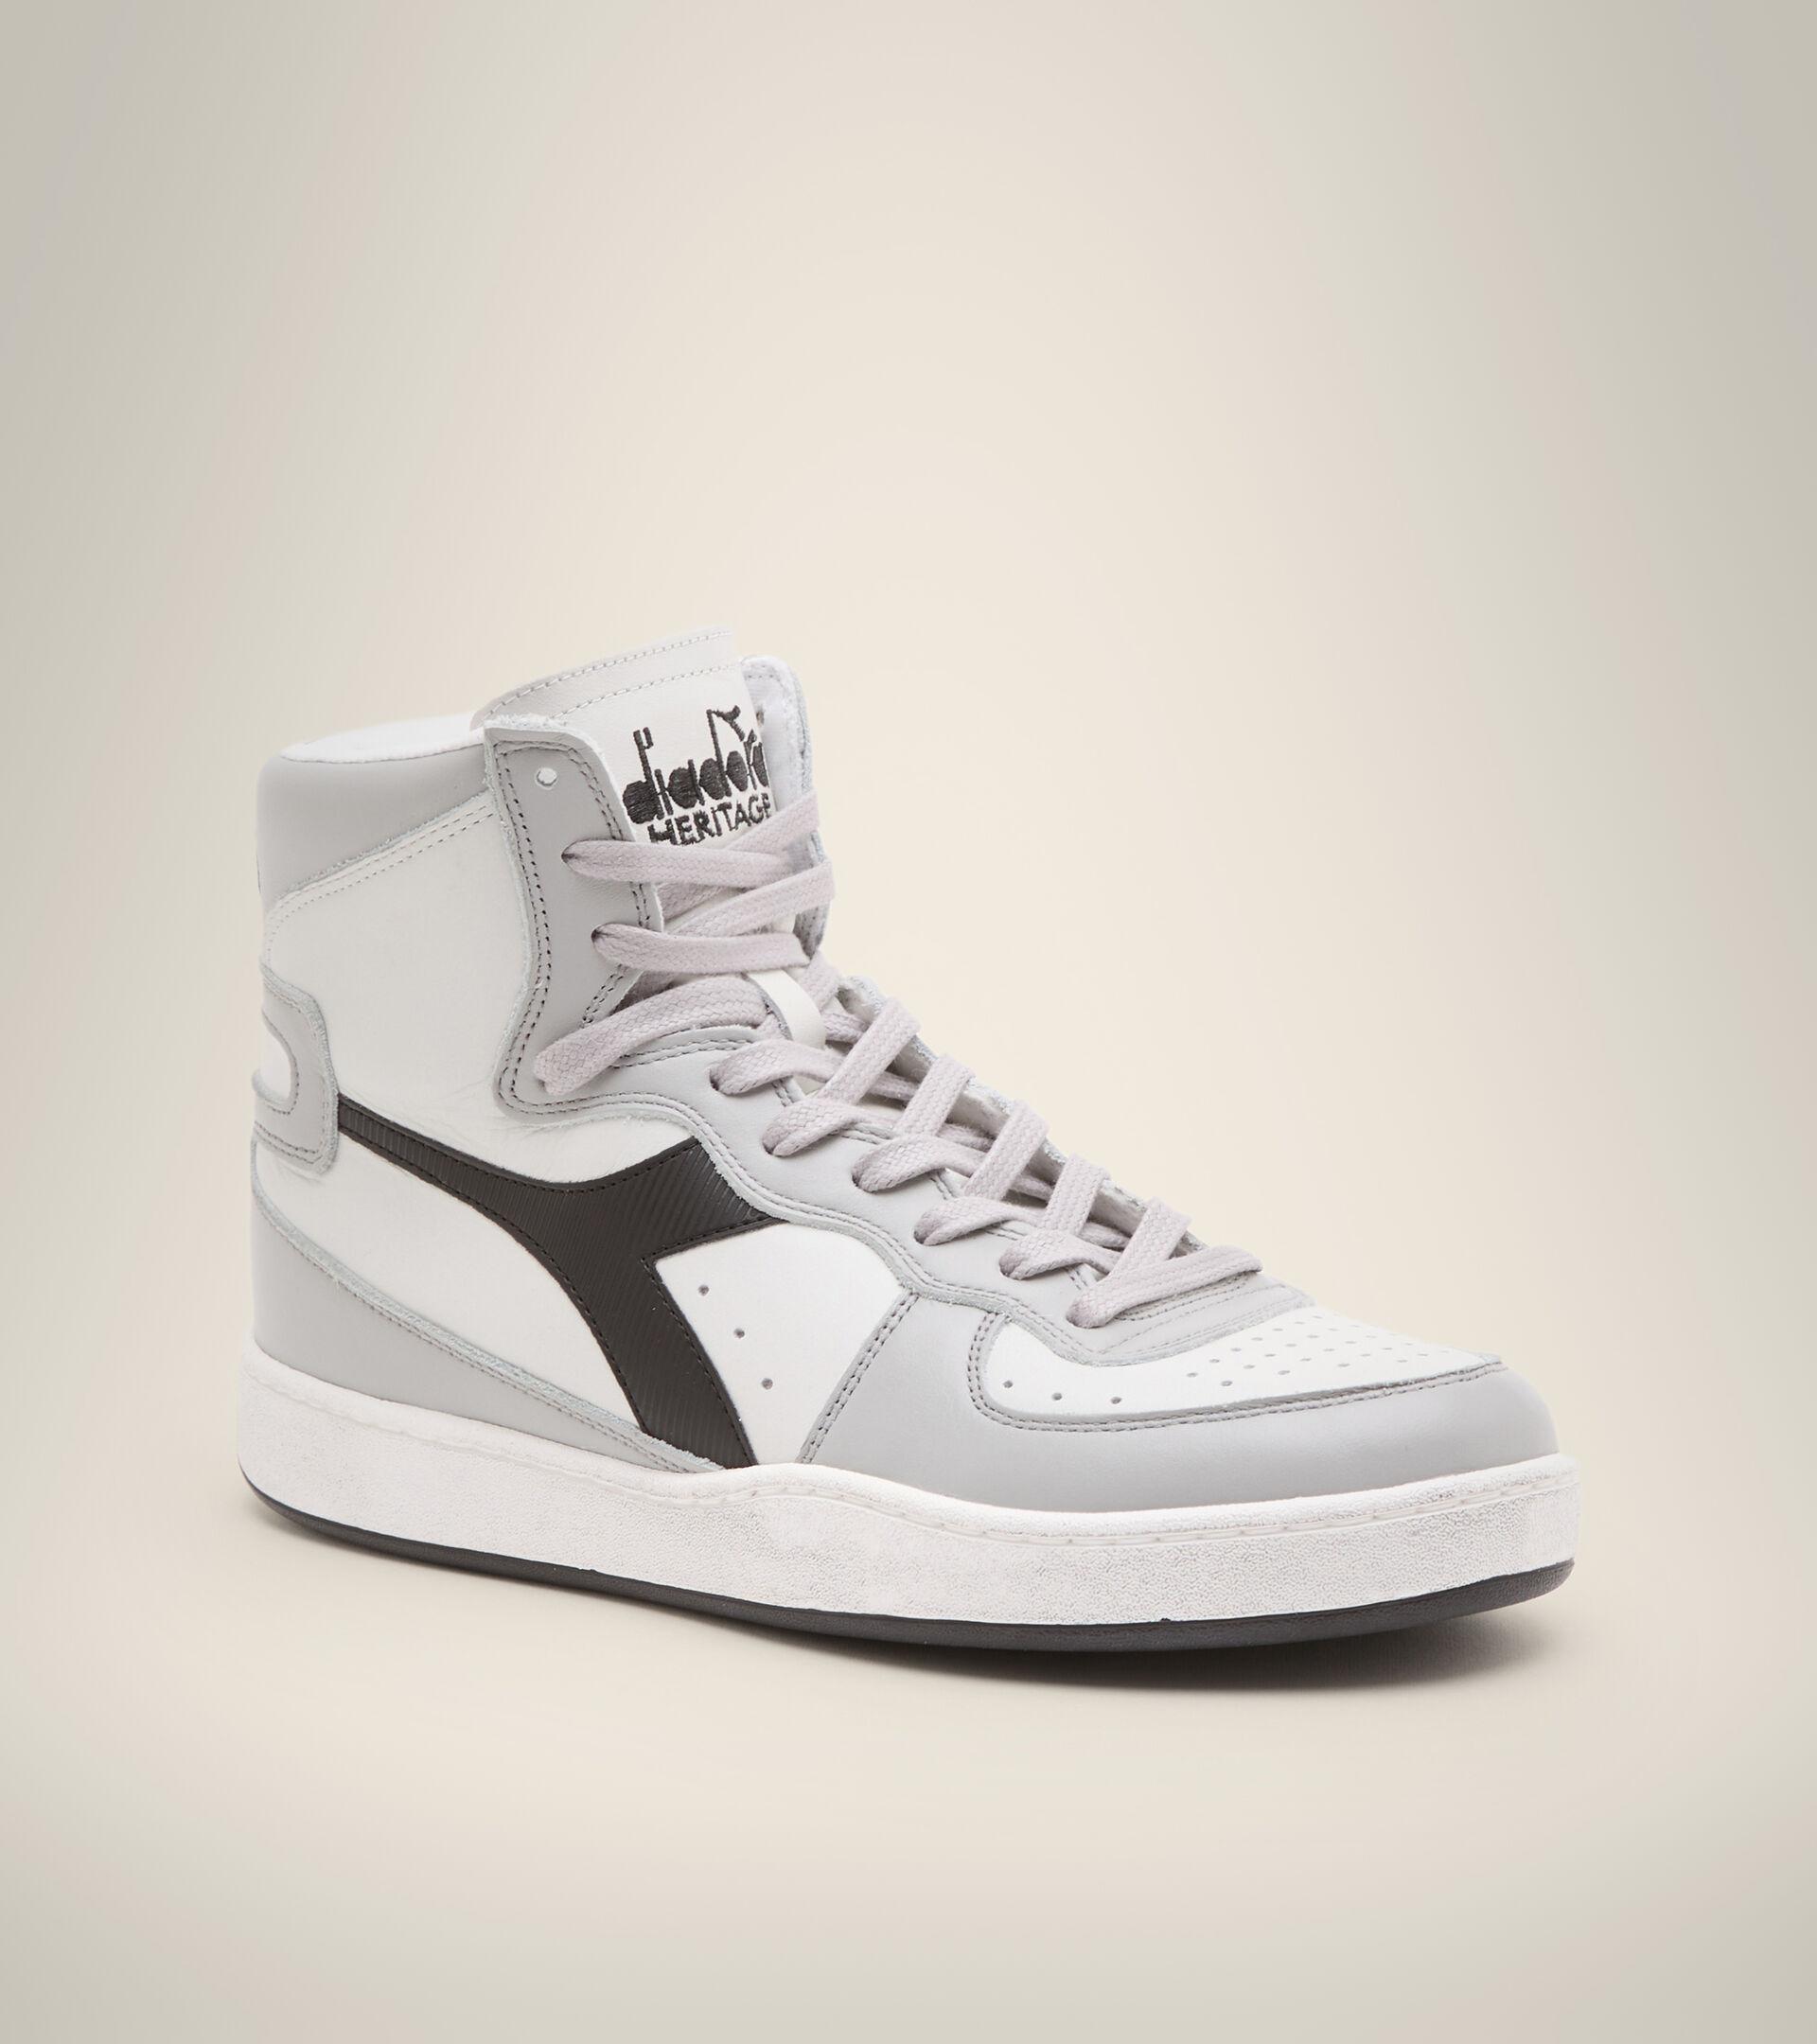 Footwear Heritage UNISEX MI BASKET USED WHITE/HIGH RISE/BLACK Diadora